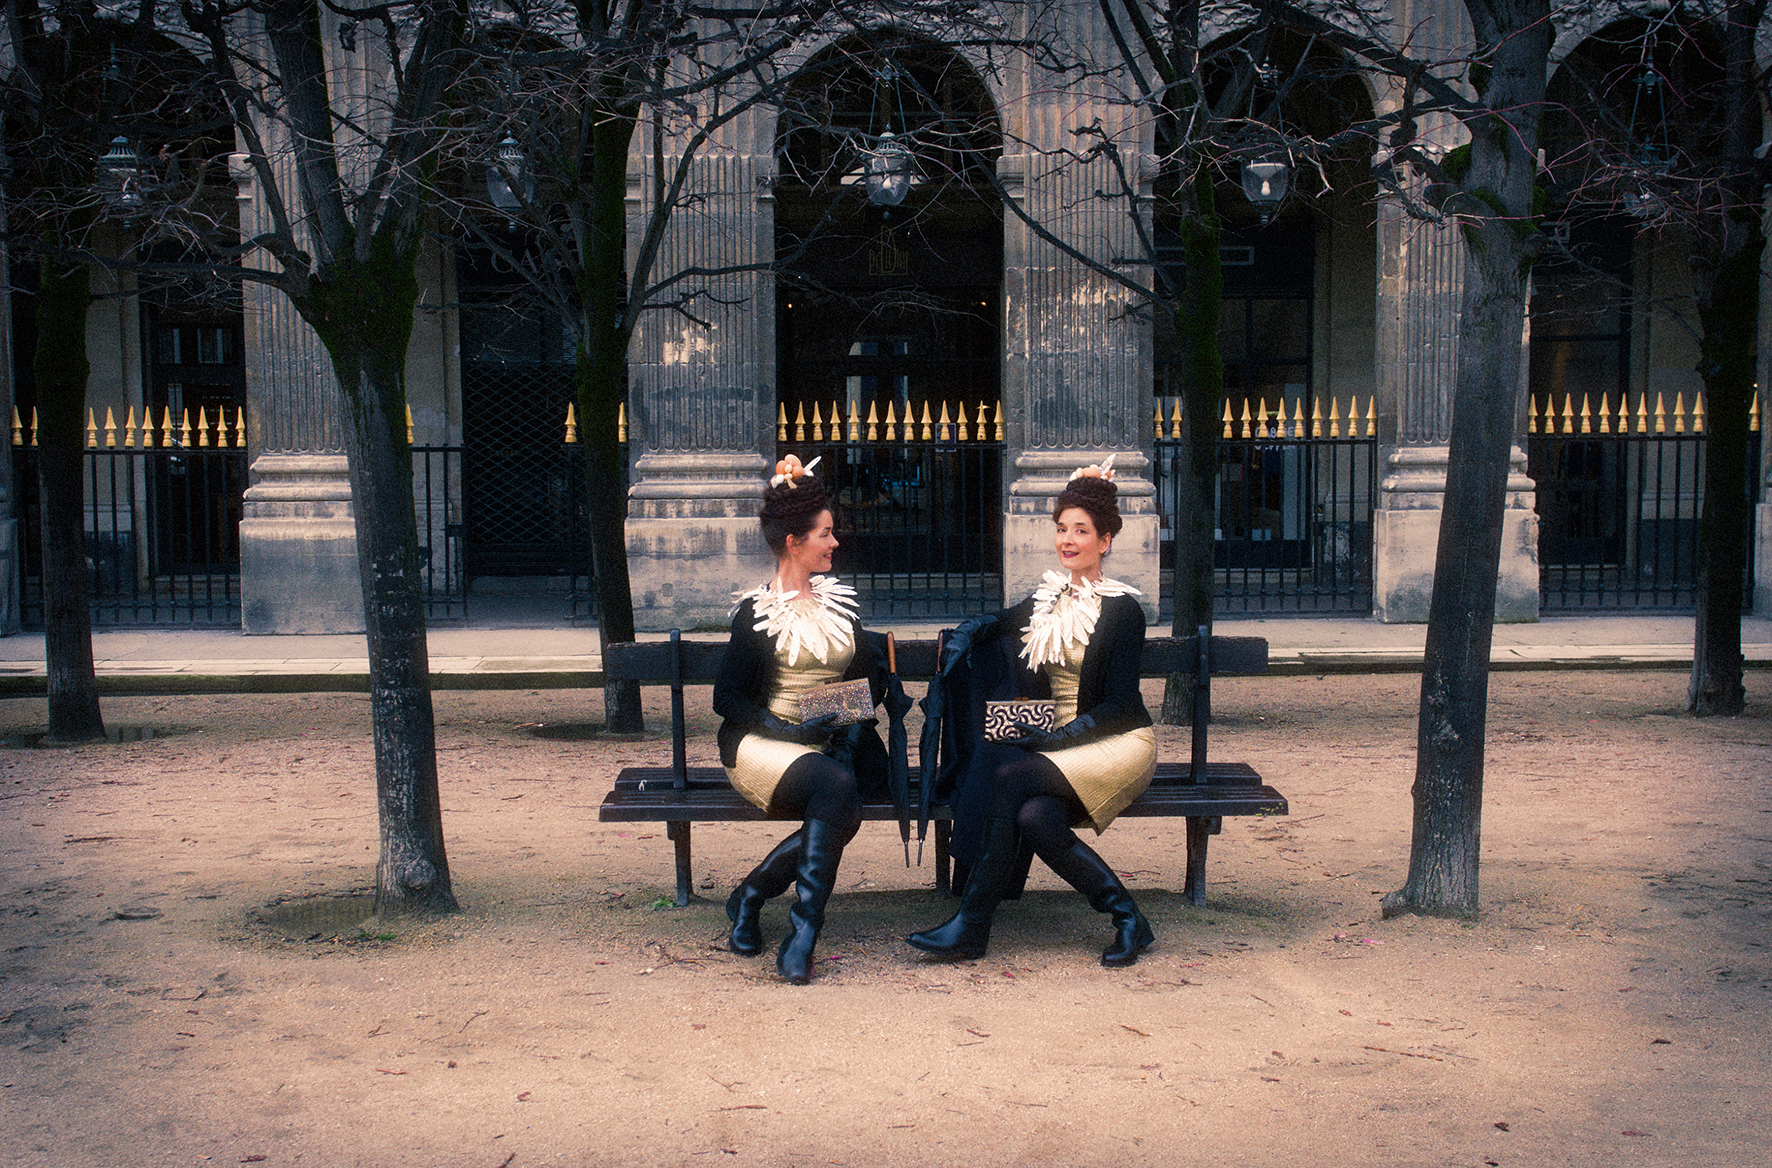 edition Poshette 2016 Palais Royal 1-Exposure